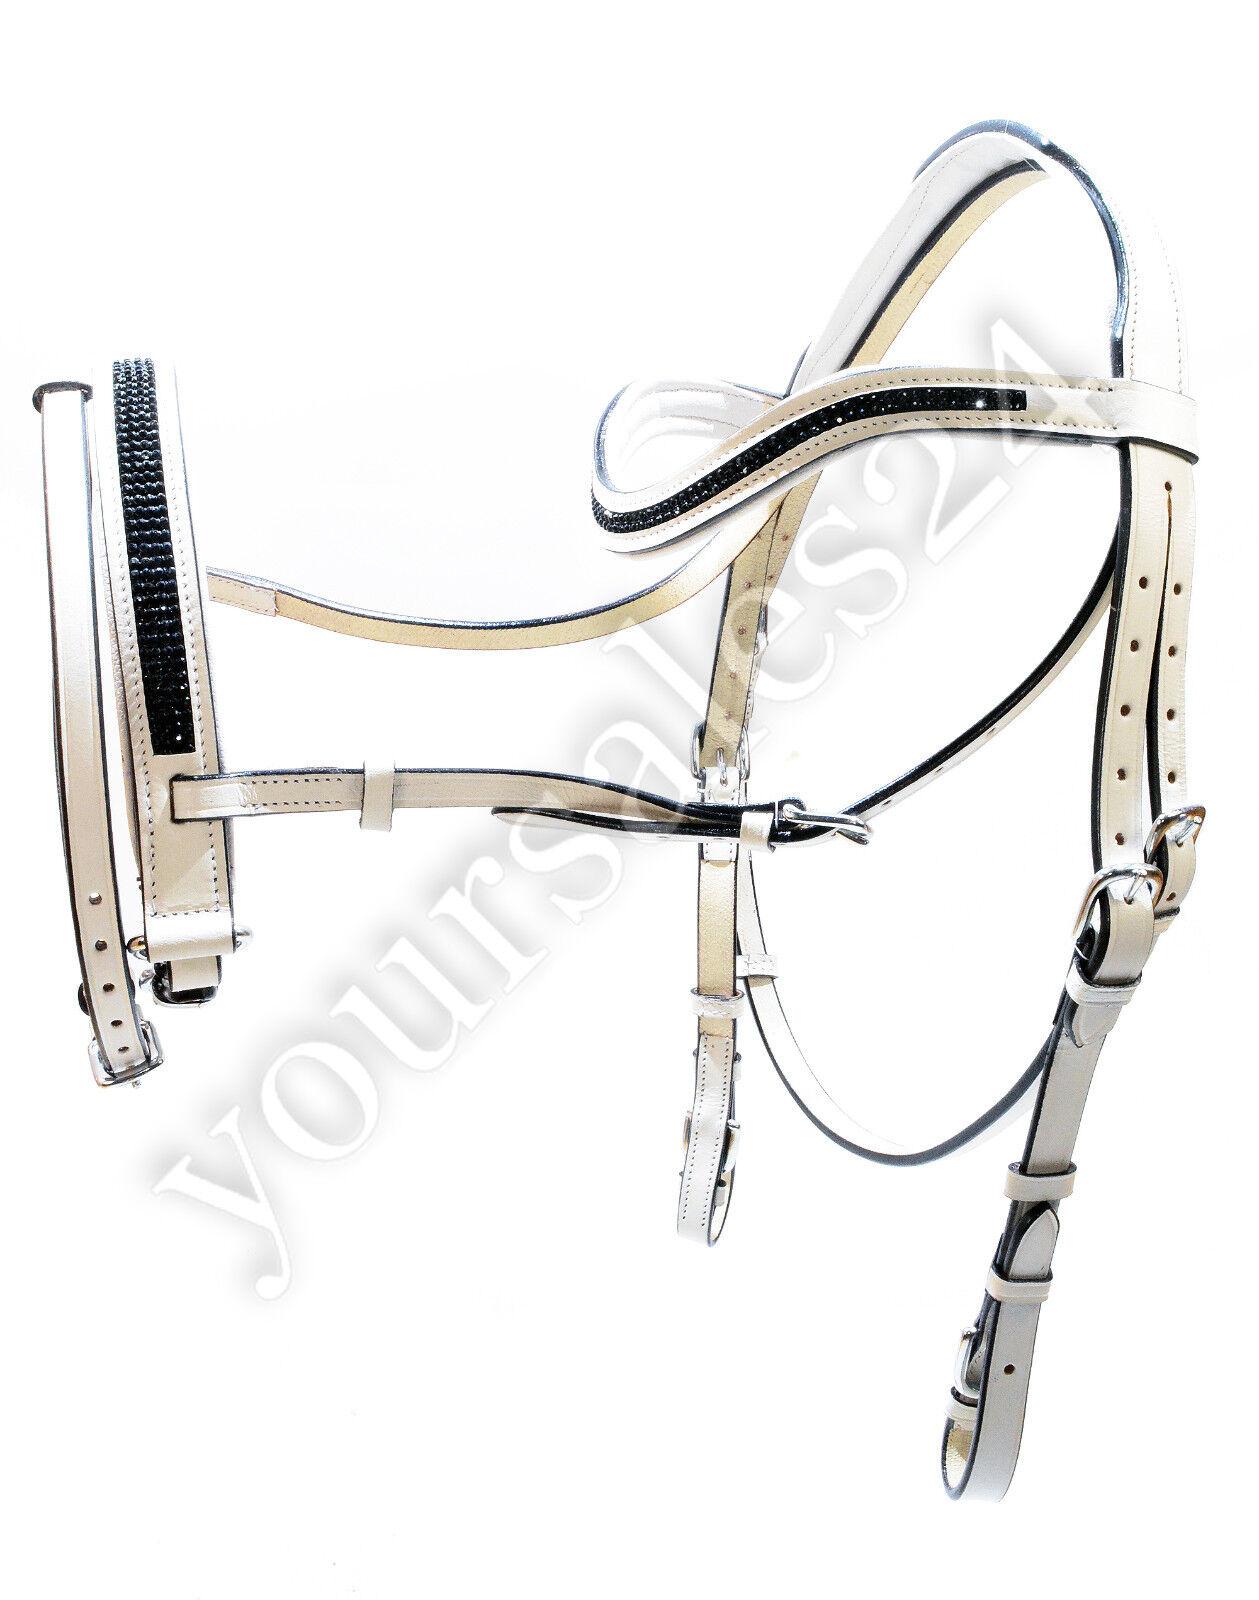 Esperia Dressur Trense Zügel Zaumzeug Voltegieren COB/Full weiß Leder; K25 75